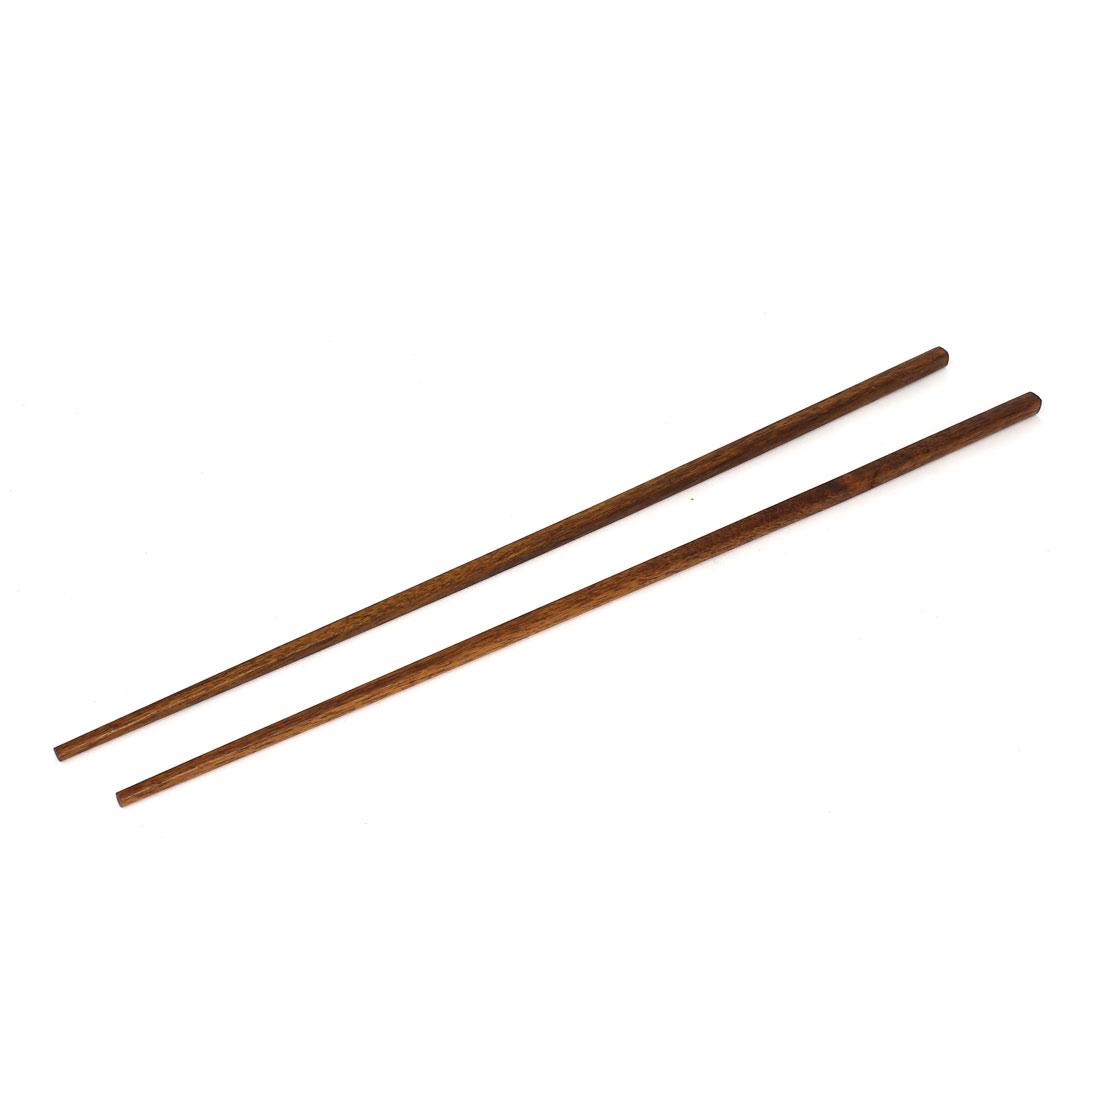 Restaurant Kitchen Hot Pot Chopsticks 16.5 Inch Length Pair Coffee Color